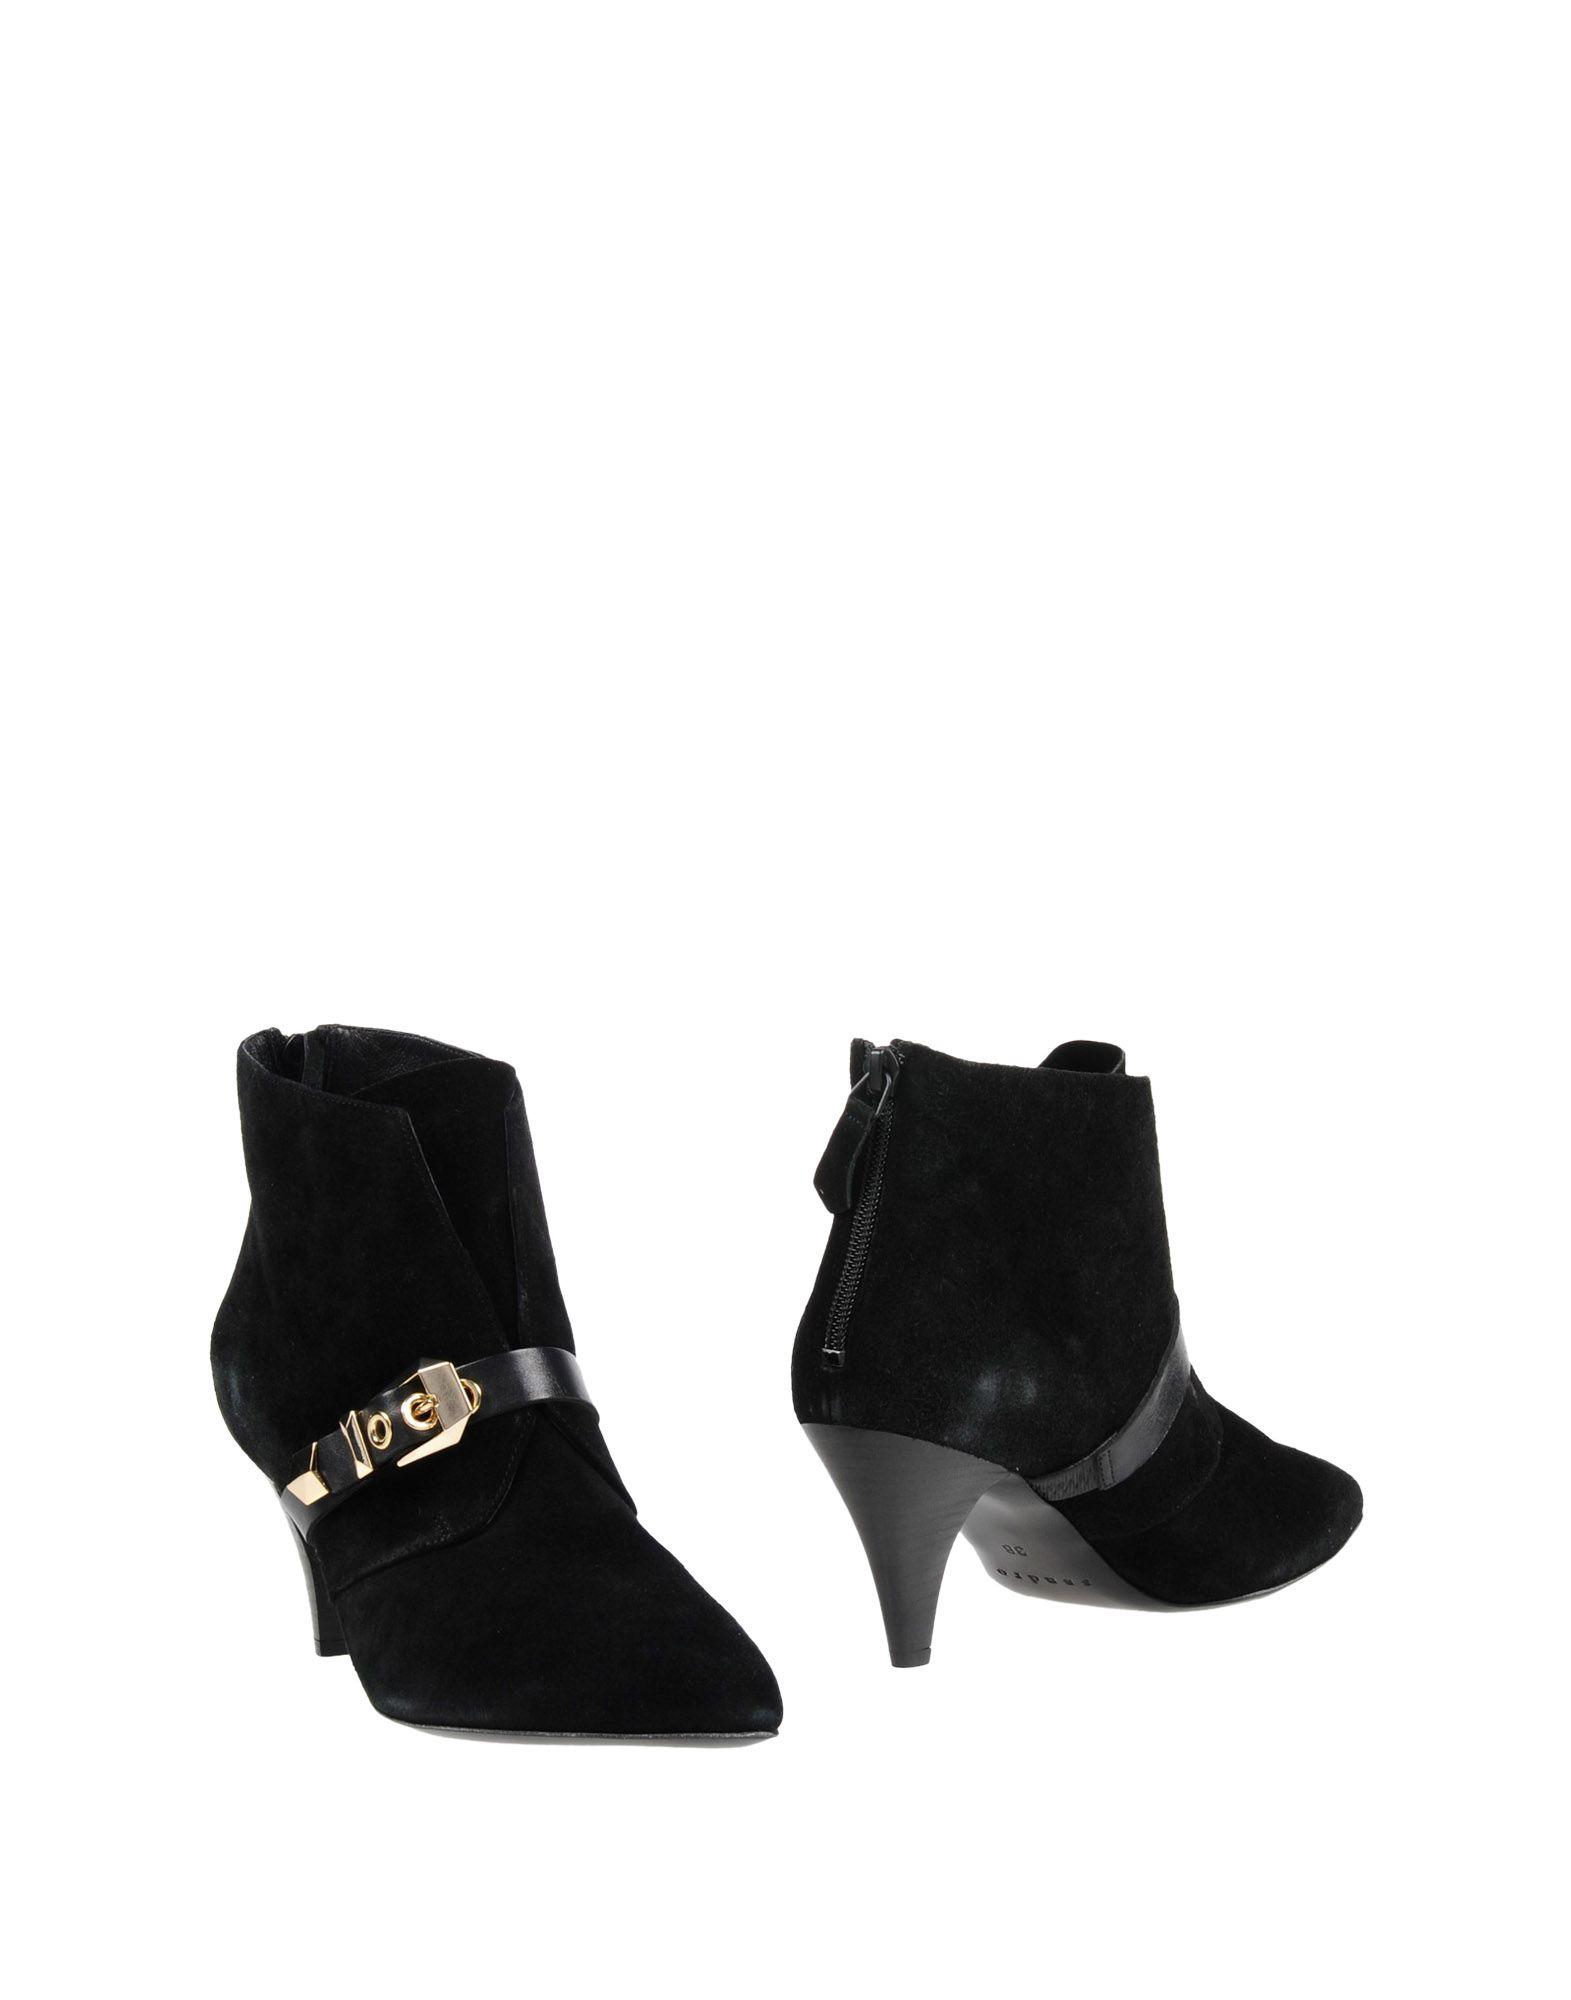 SANDRO PARIS Ankle Boot in Black